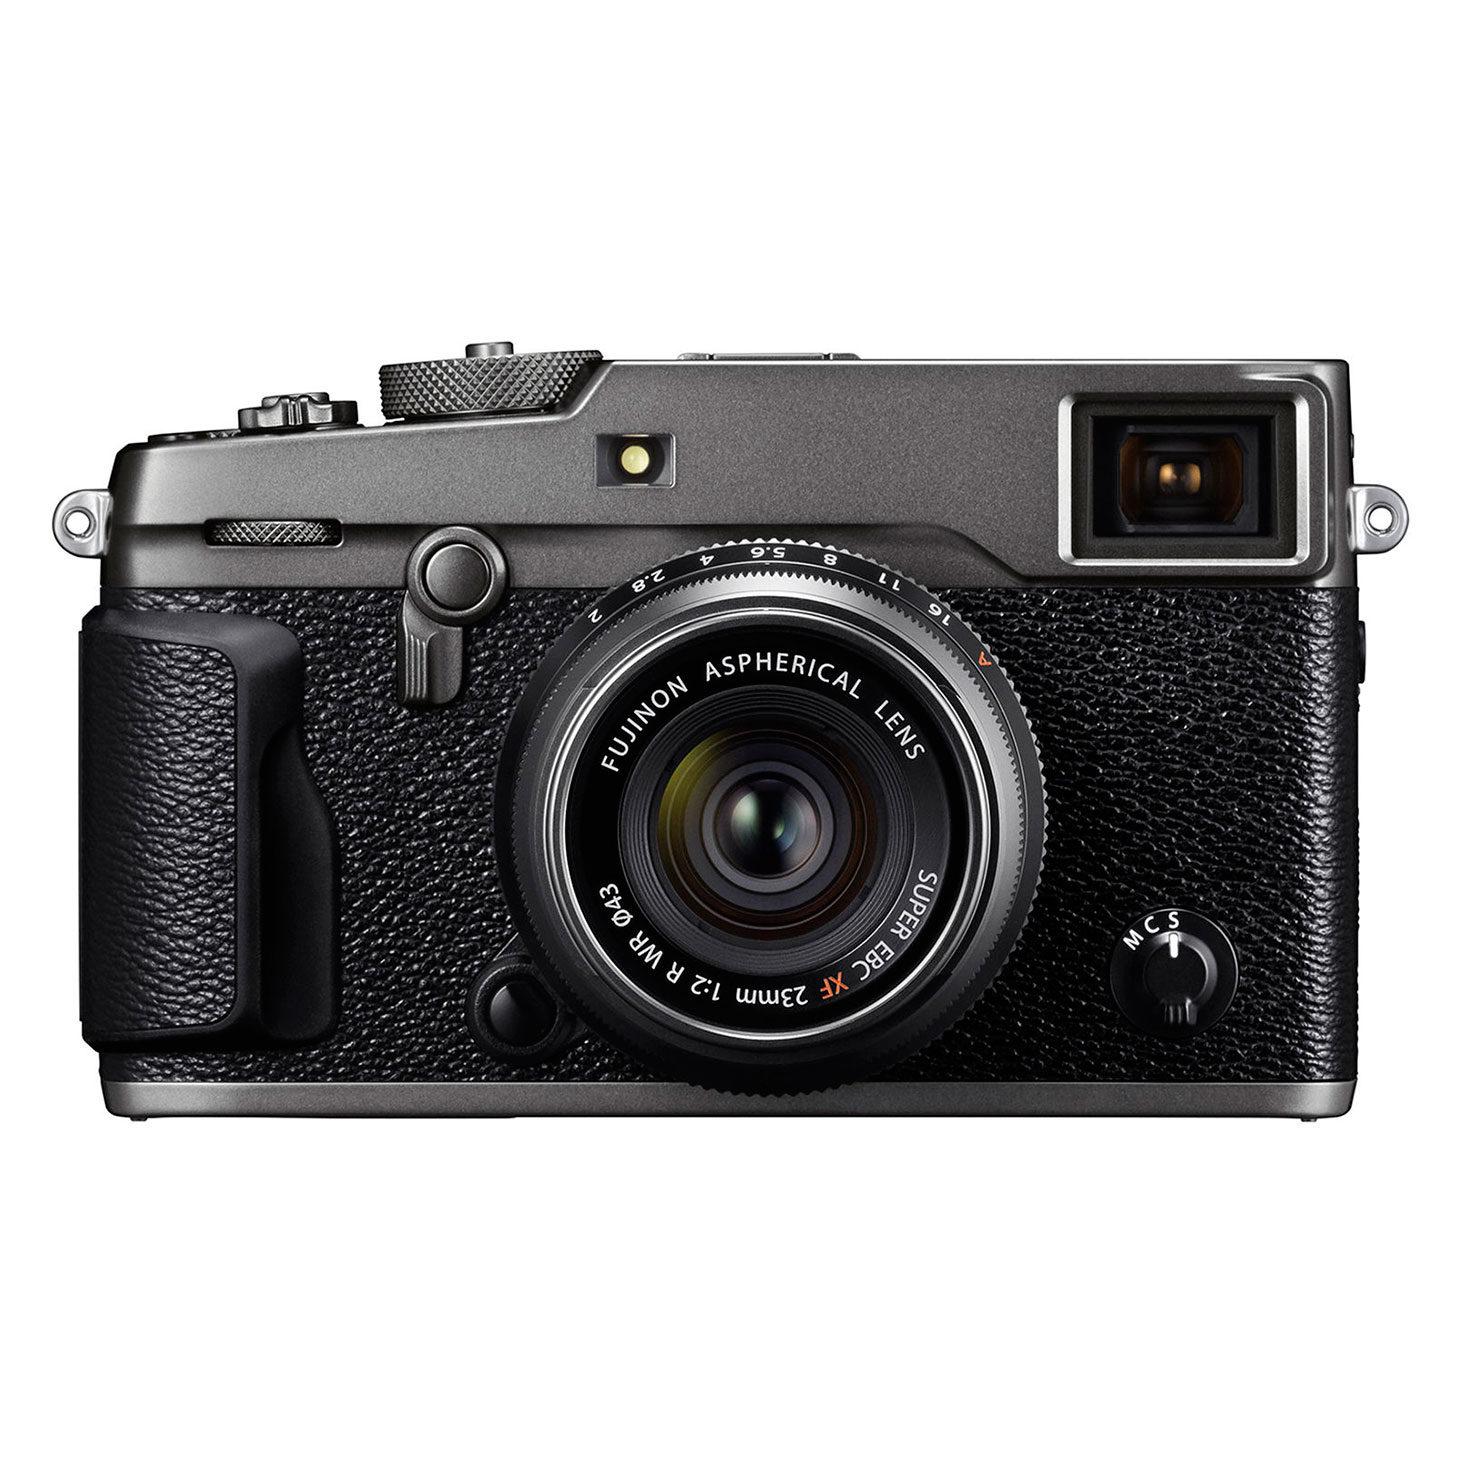 Fujifilm X-Pro2 systeemcamera Graphite + 23mm <br/>€ 1999.00 <br/> <a href='https://www.cameranu.nl/fotografie/?tt=12190_474631_241358_&r=https%3A%2F%2Fwww.cameranu.nl%2Fnl%2Fp1530715%2Ffujifilm-x-pro2-systeemcamera-graphite-23mm%3Fchannable%3De10841.MTUzMDcxNQ%26utm_campaign%3D%26utm_content%3DSysteemcamera%26utm_source%3DTradetracker%26utm_medium%3Dcpc%26utm_term%3DDigitale%2Bcamera%26apos%3Bs' target='_blank'>naar de winkel</a>